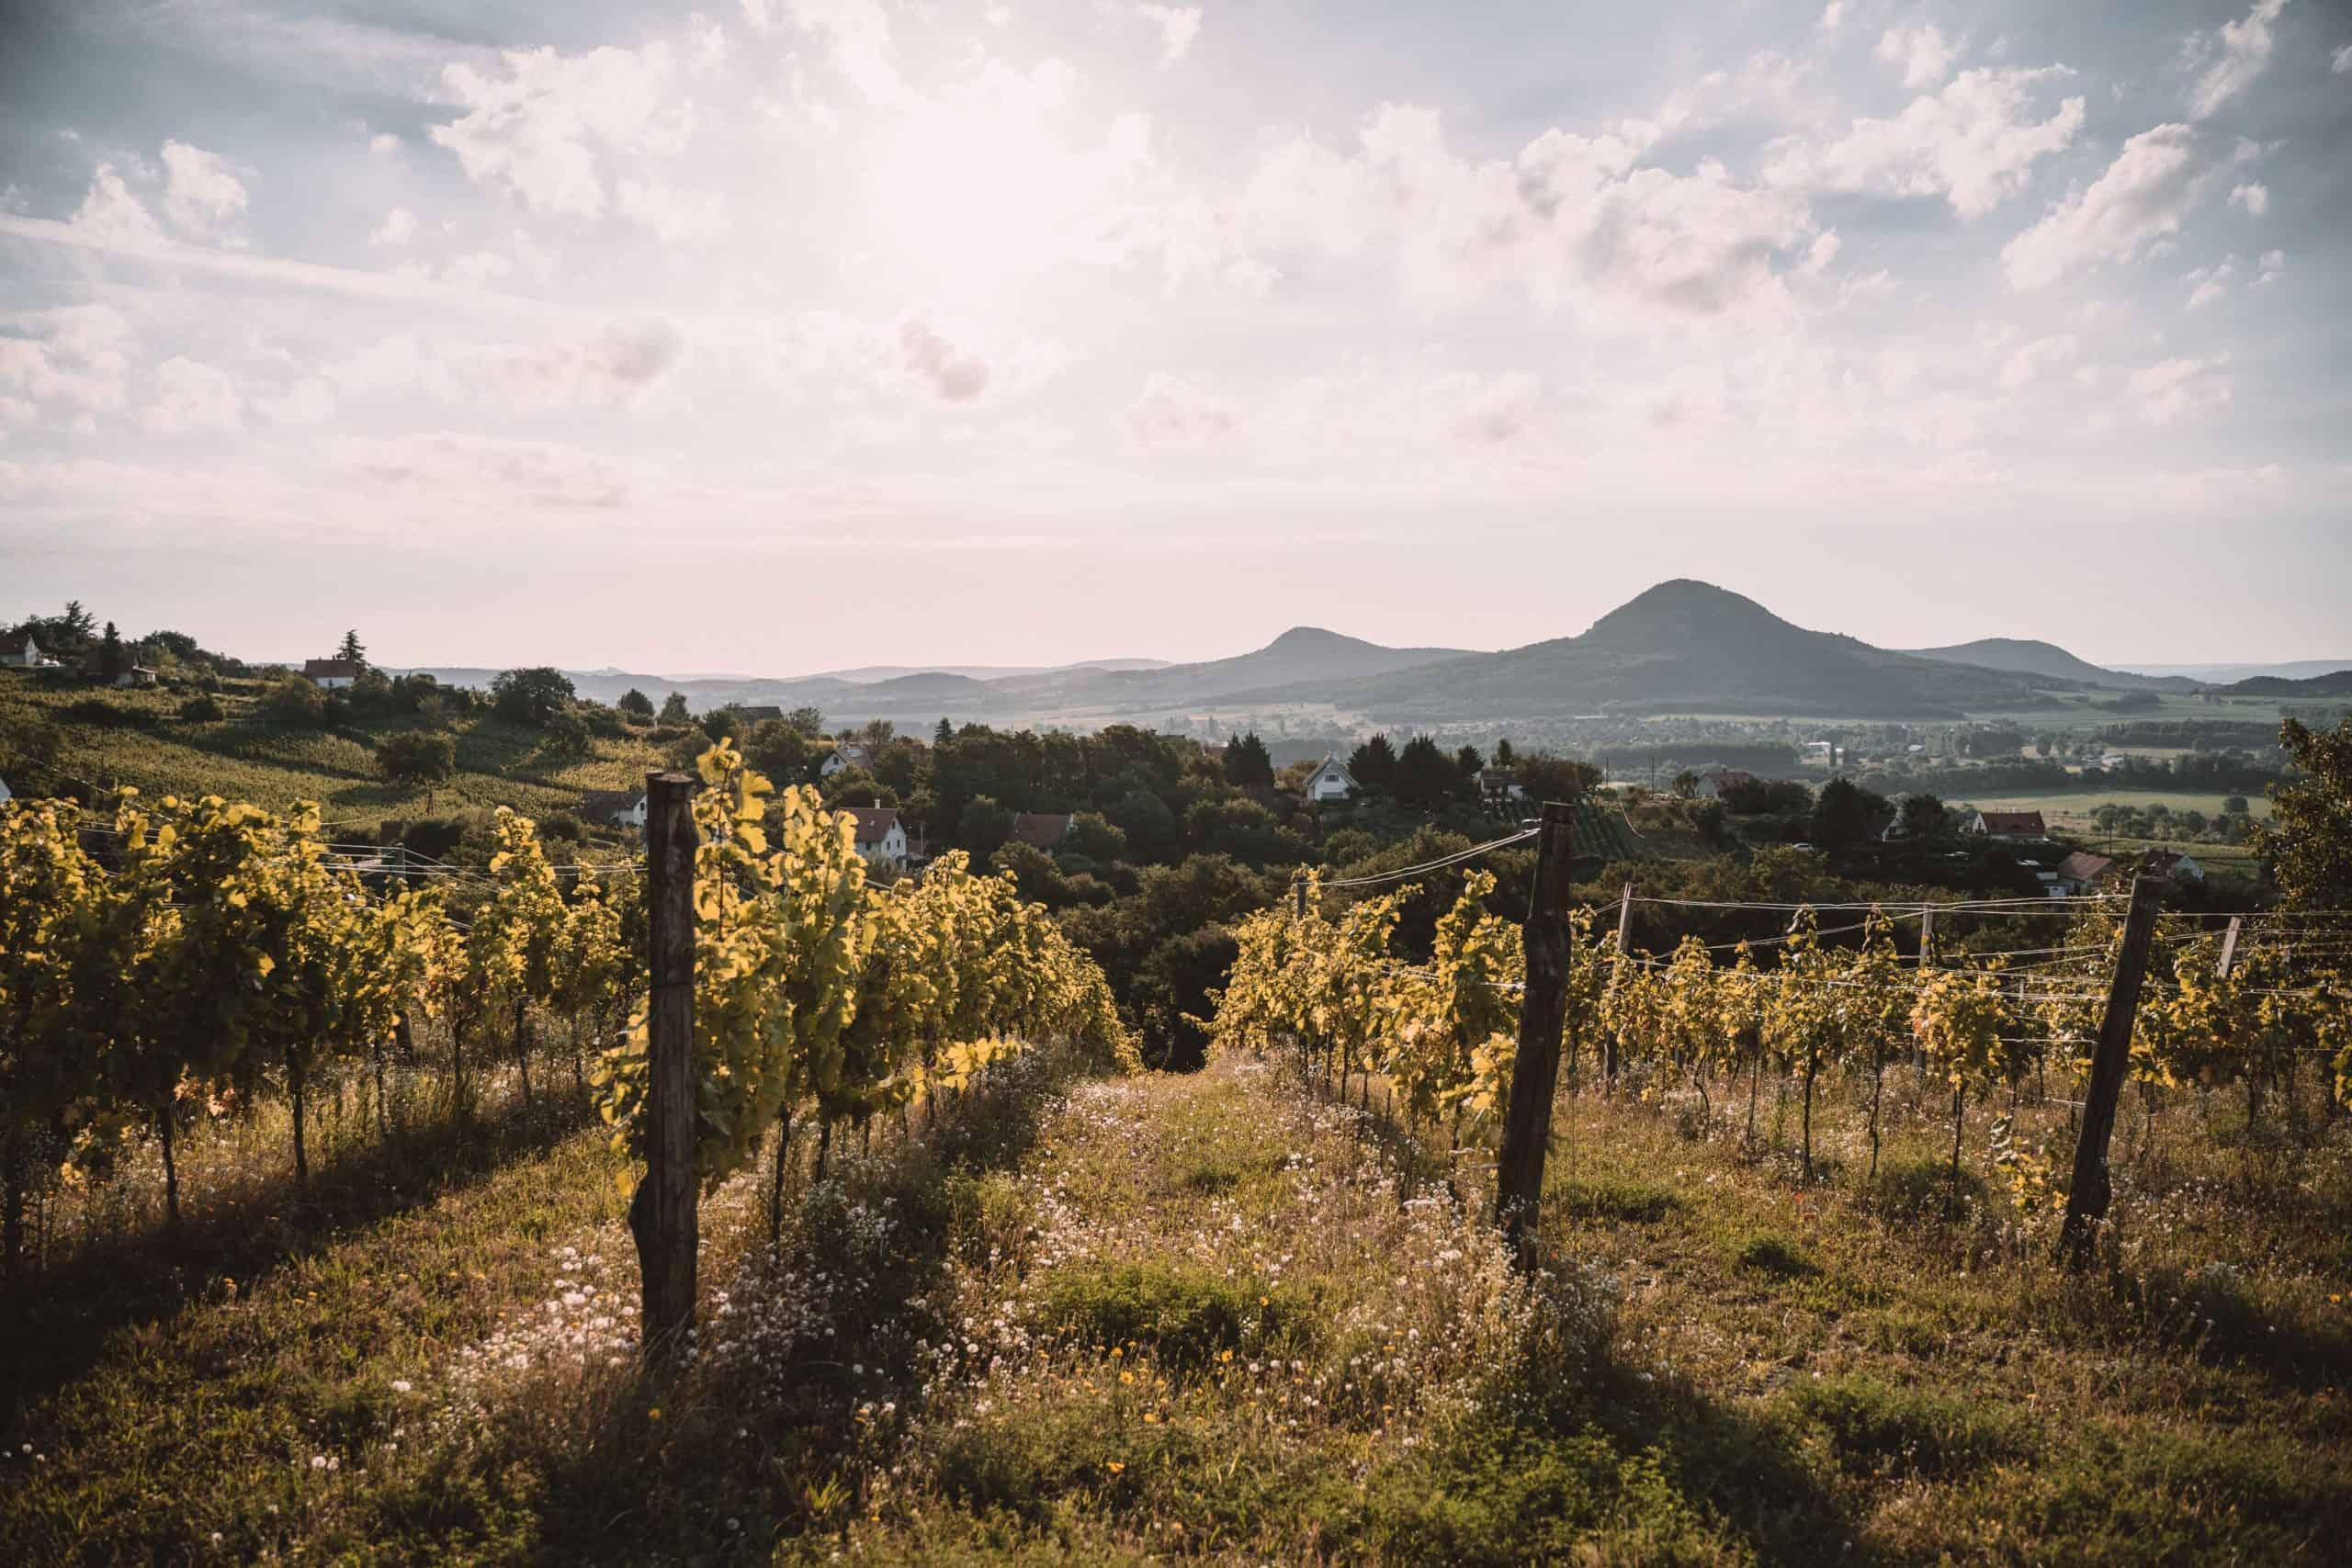 sunrise over wineries badacsony balaton